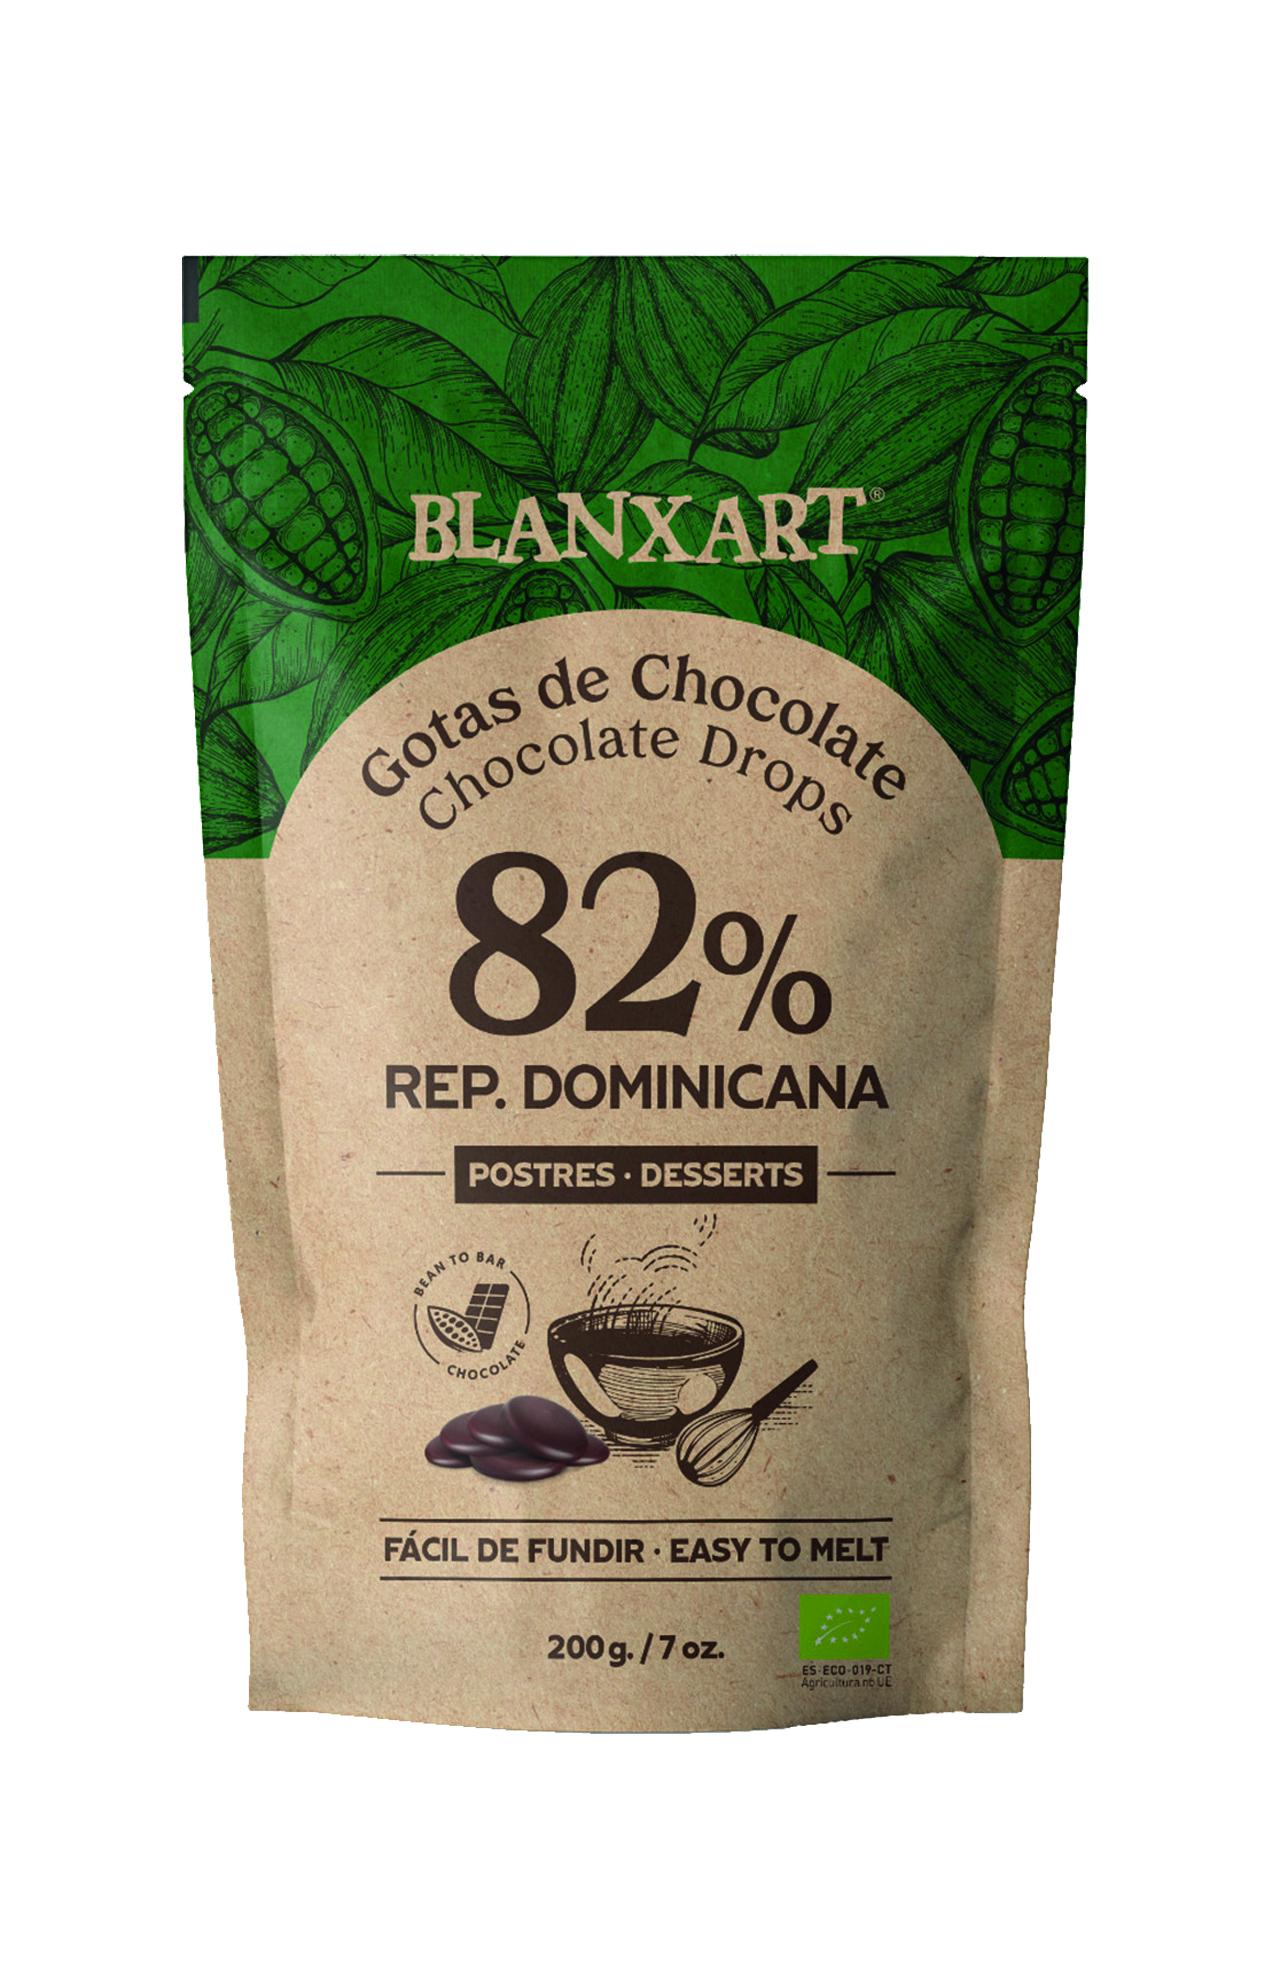 BLANXART   Schokoladendrops »Rep. Dominicana« 82%